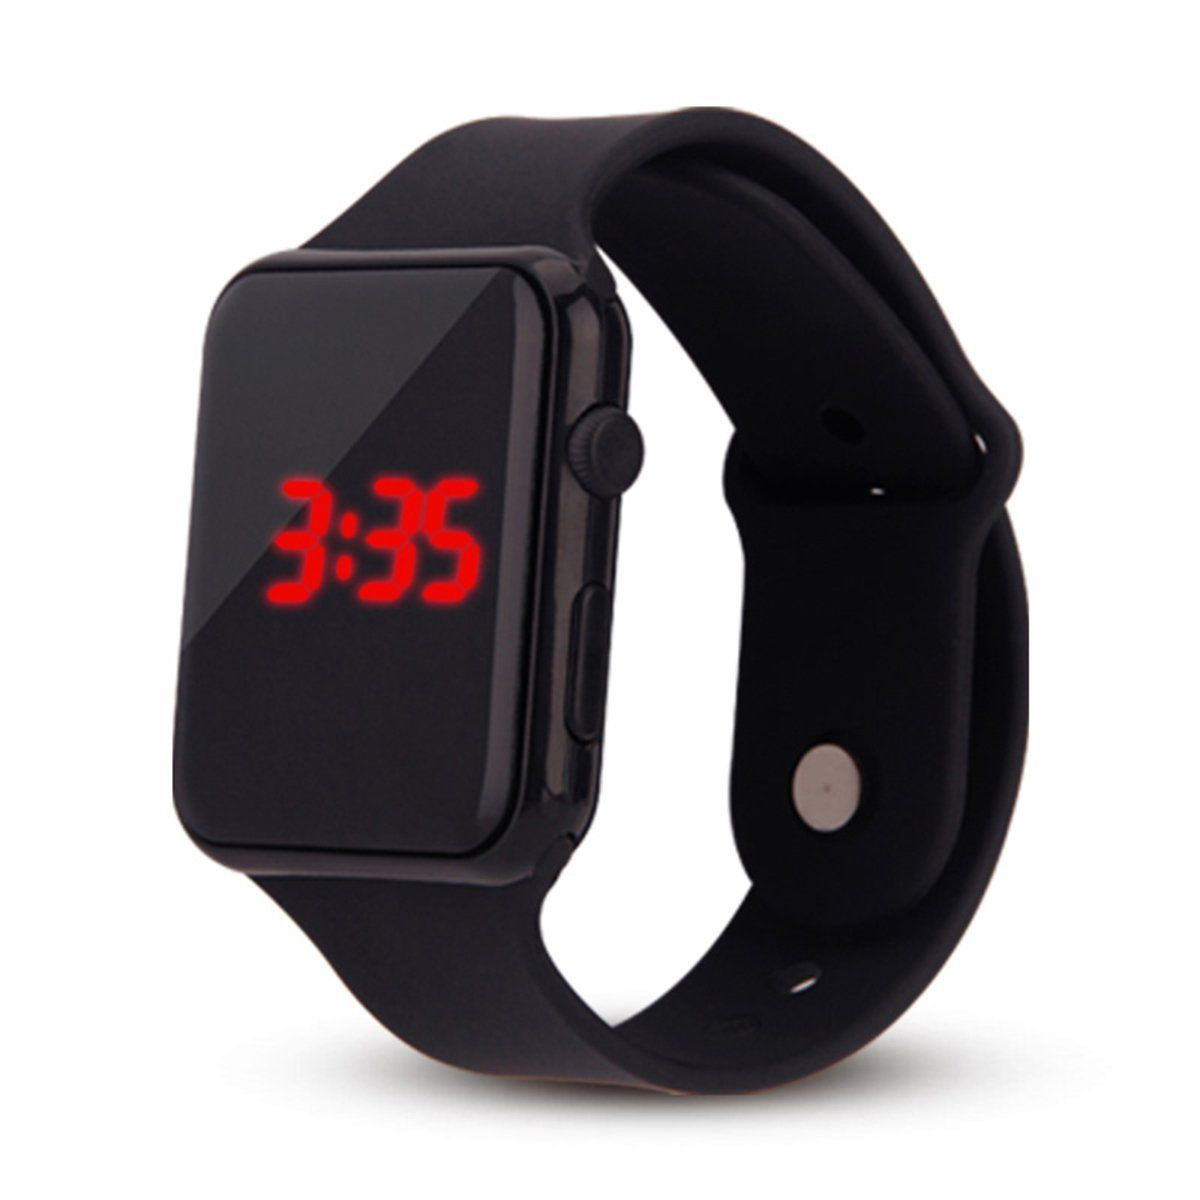 2018 HOT New Unisex Digital LED Sports Watch Silicone Band Wrist Watches Men Children Fashion 11.19(China)